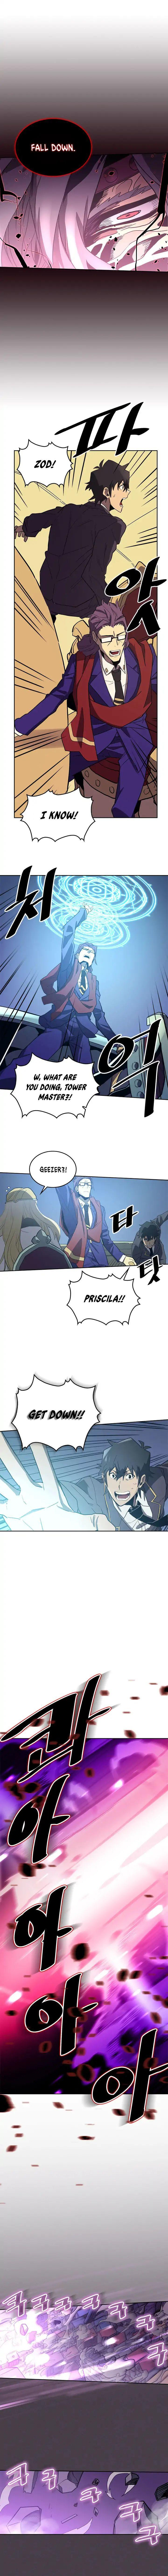 A Returner's Magic Should Be Special Chapter 79 page 5 - Mangakakalots.com